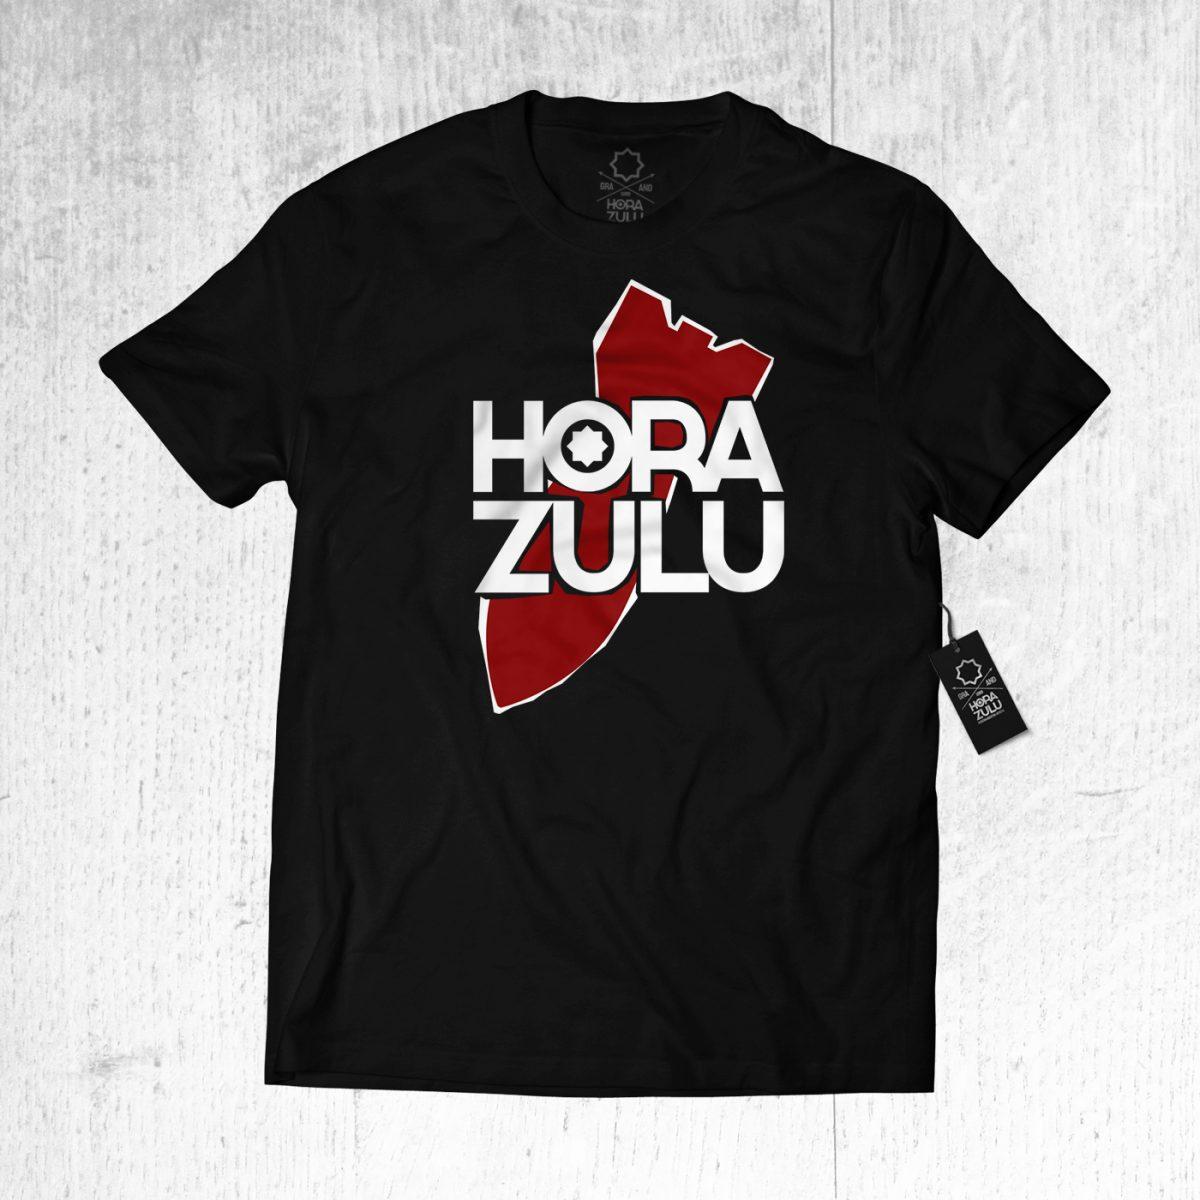 Camiseta Hora Zulu modelo Bomb